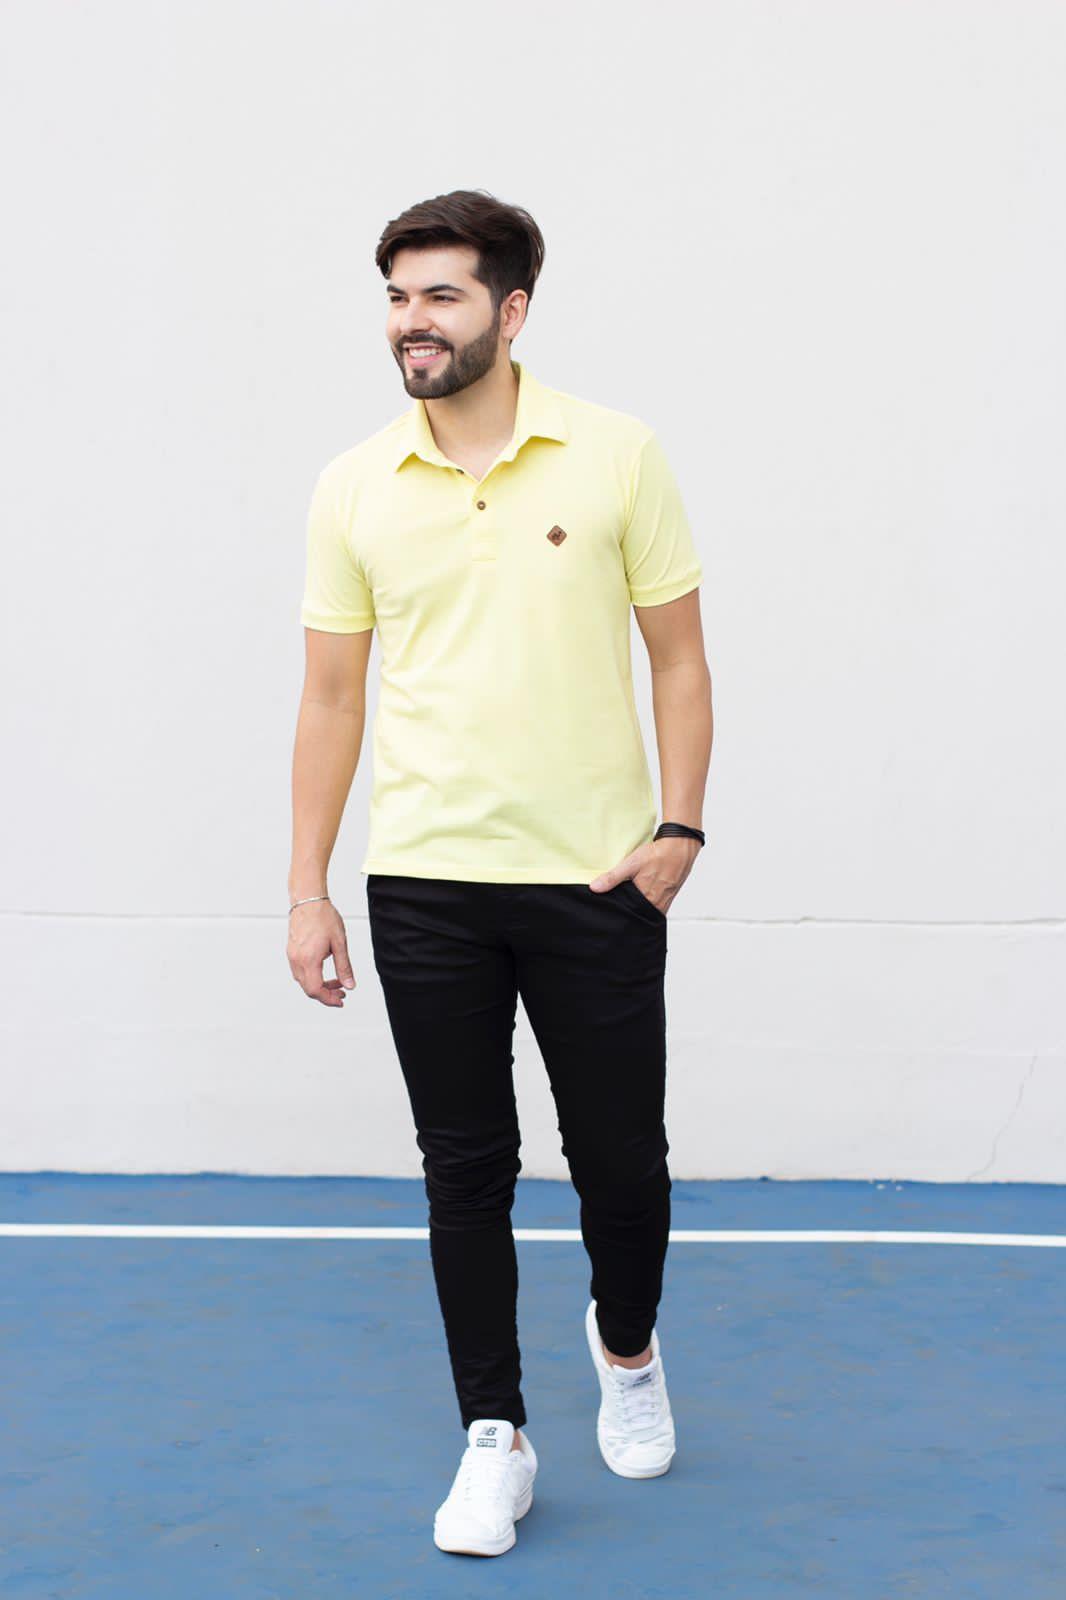 Camiseta Gola Polo Amarela Piquet Manguu